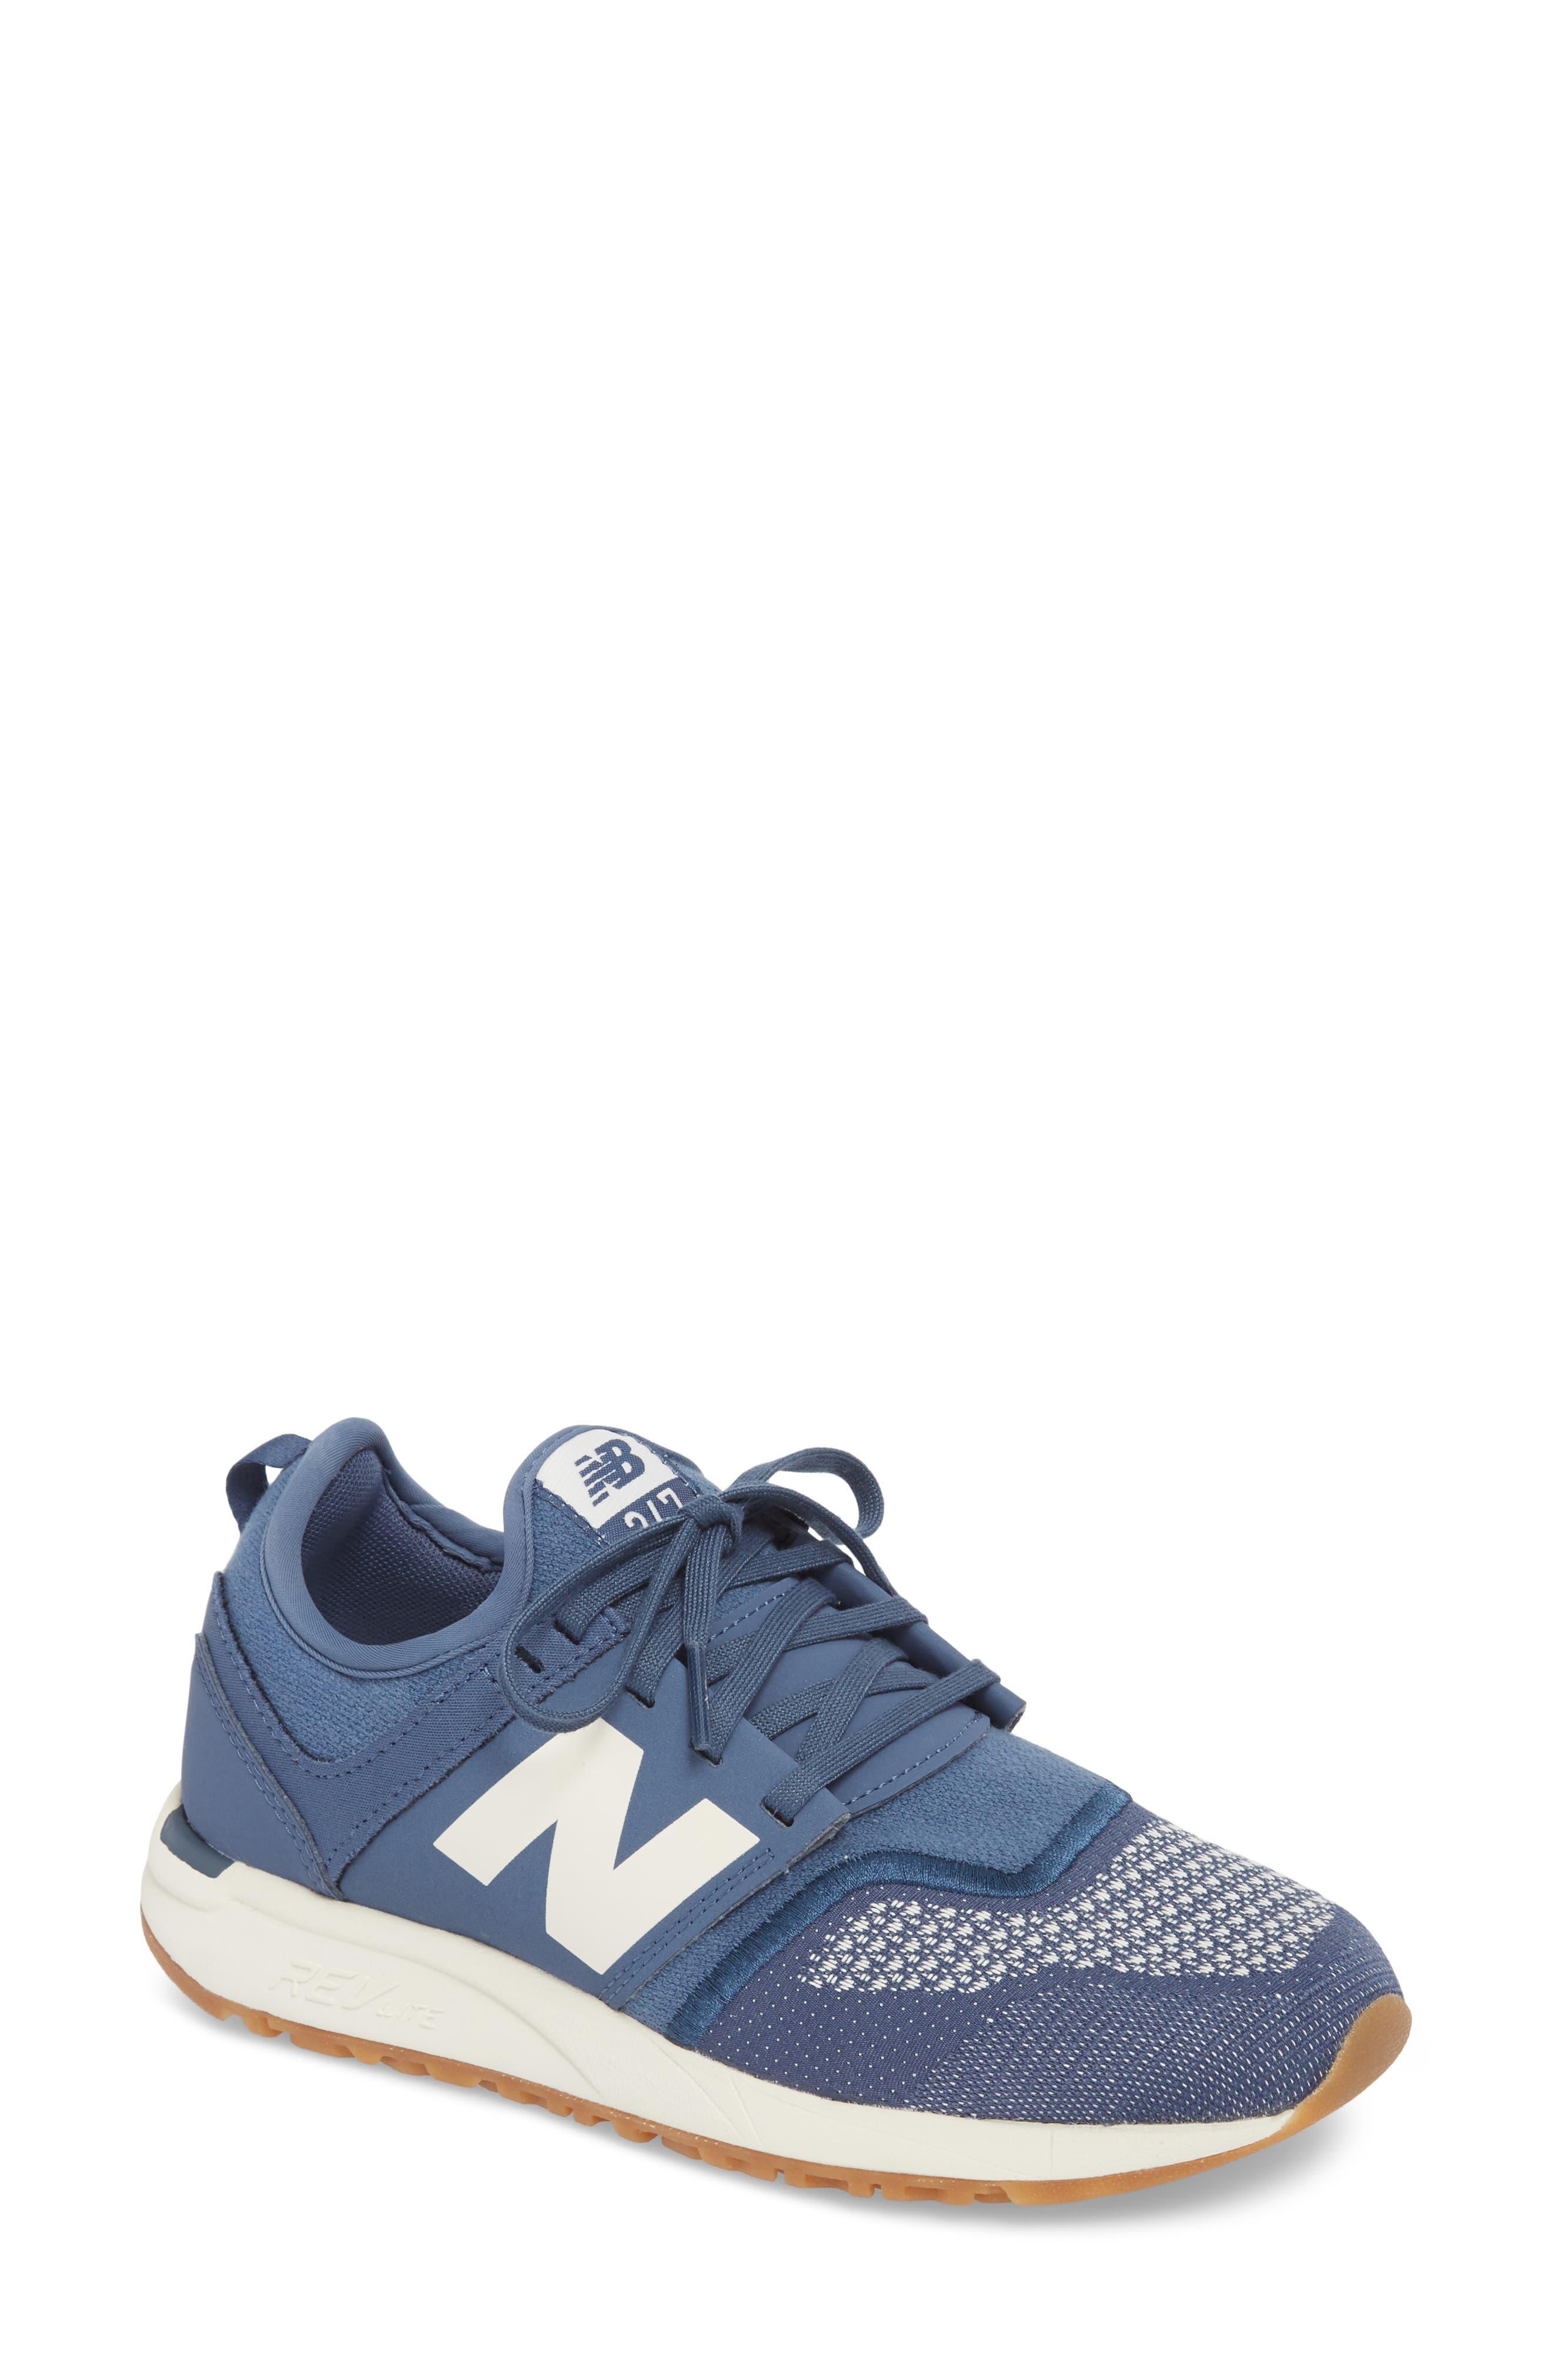 Main Image - New Balance Sport Style 247 Sneaker (Women)